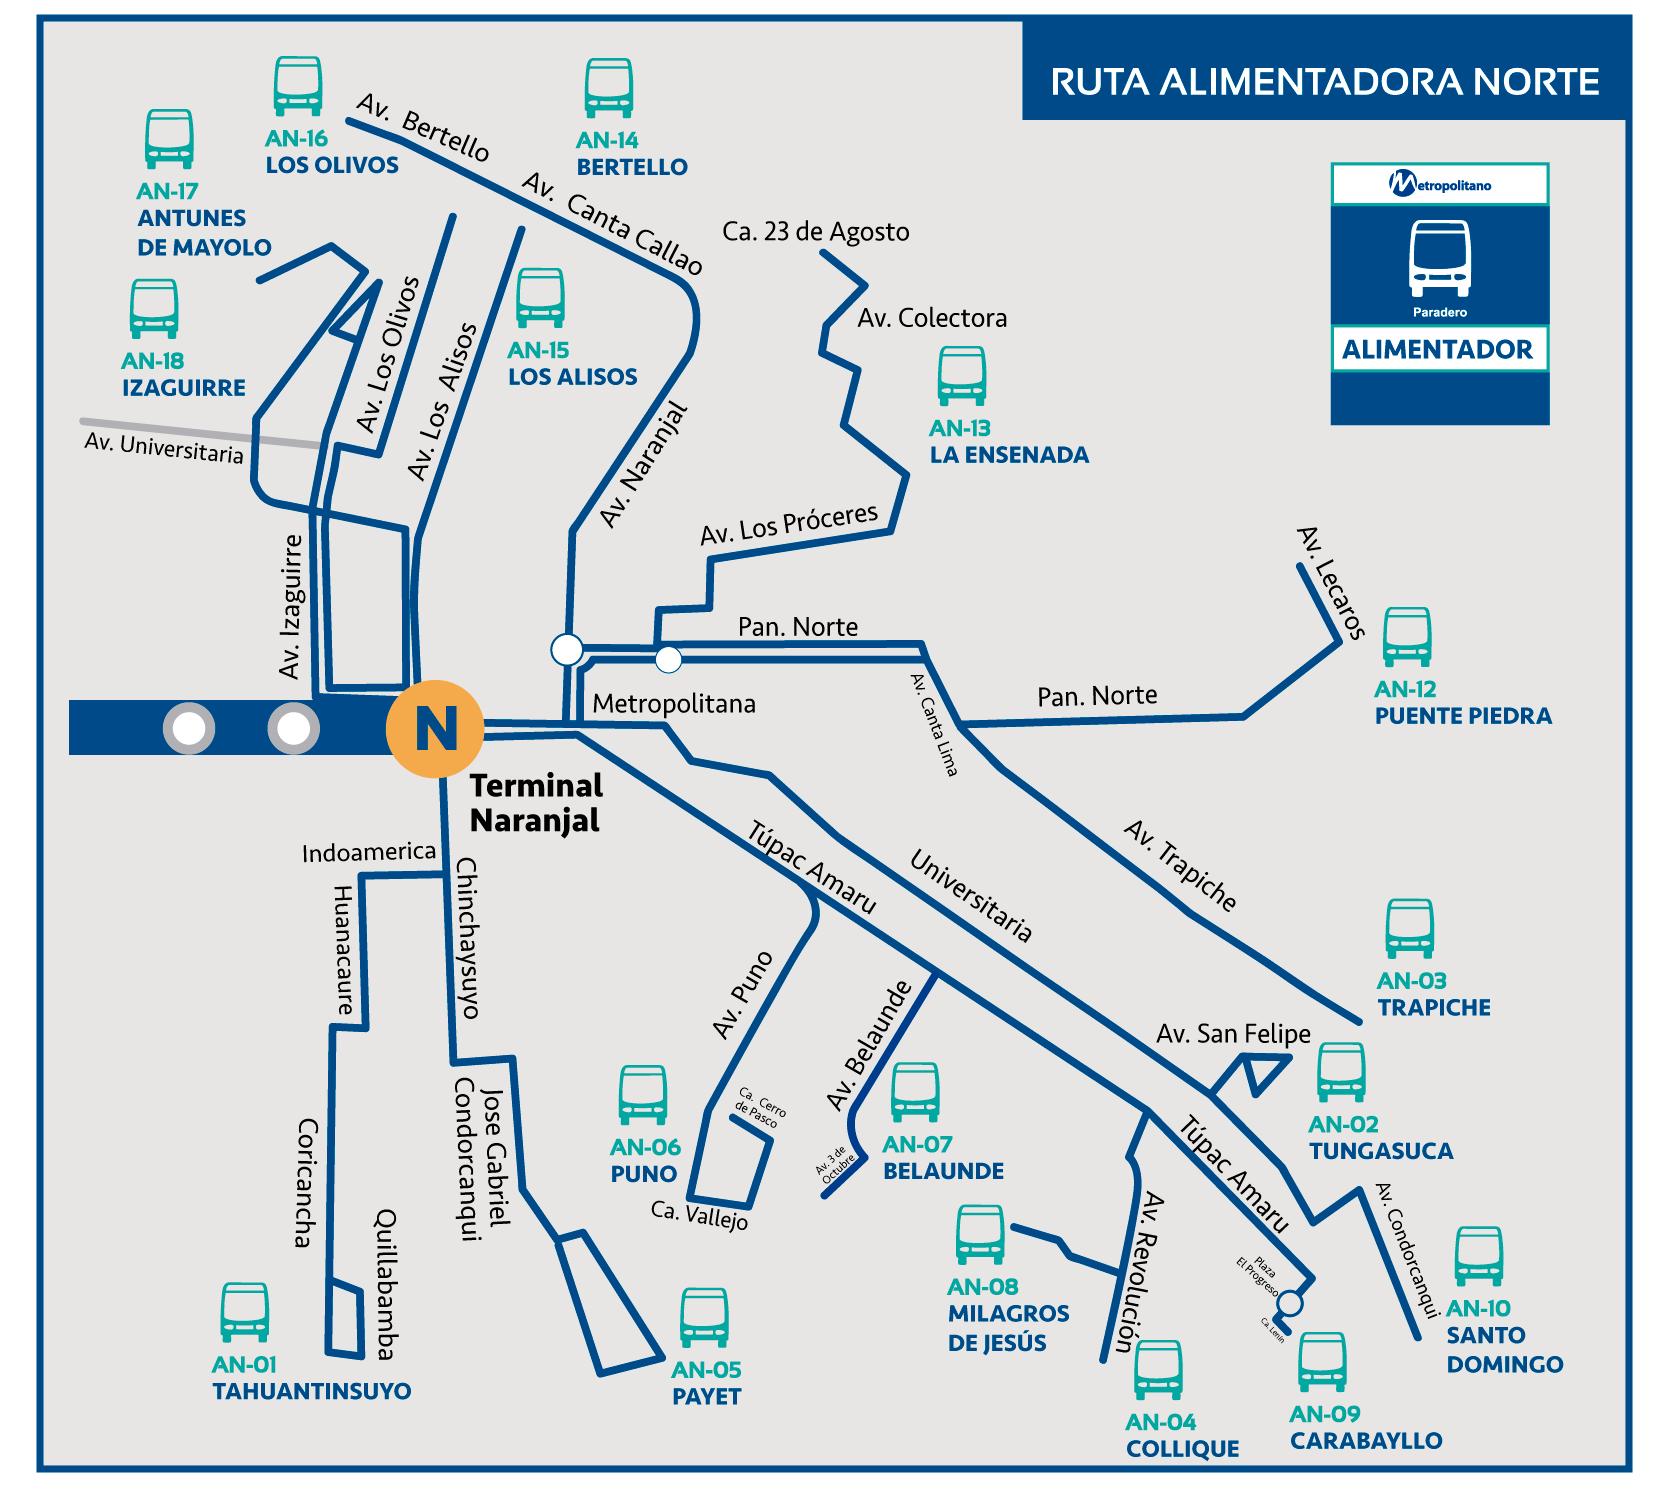 RUTA-ALIMENTADORA-NORTE